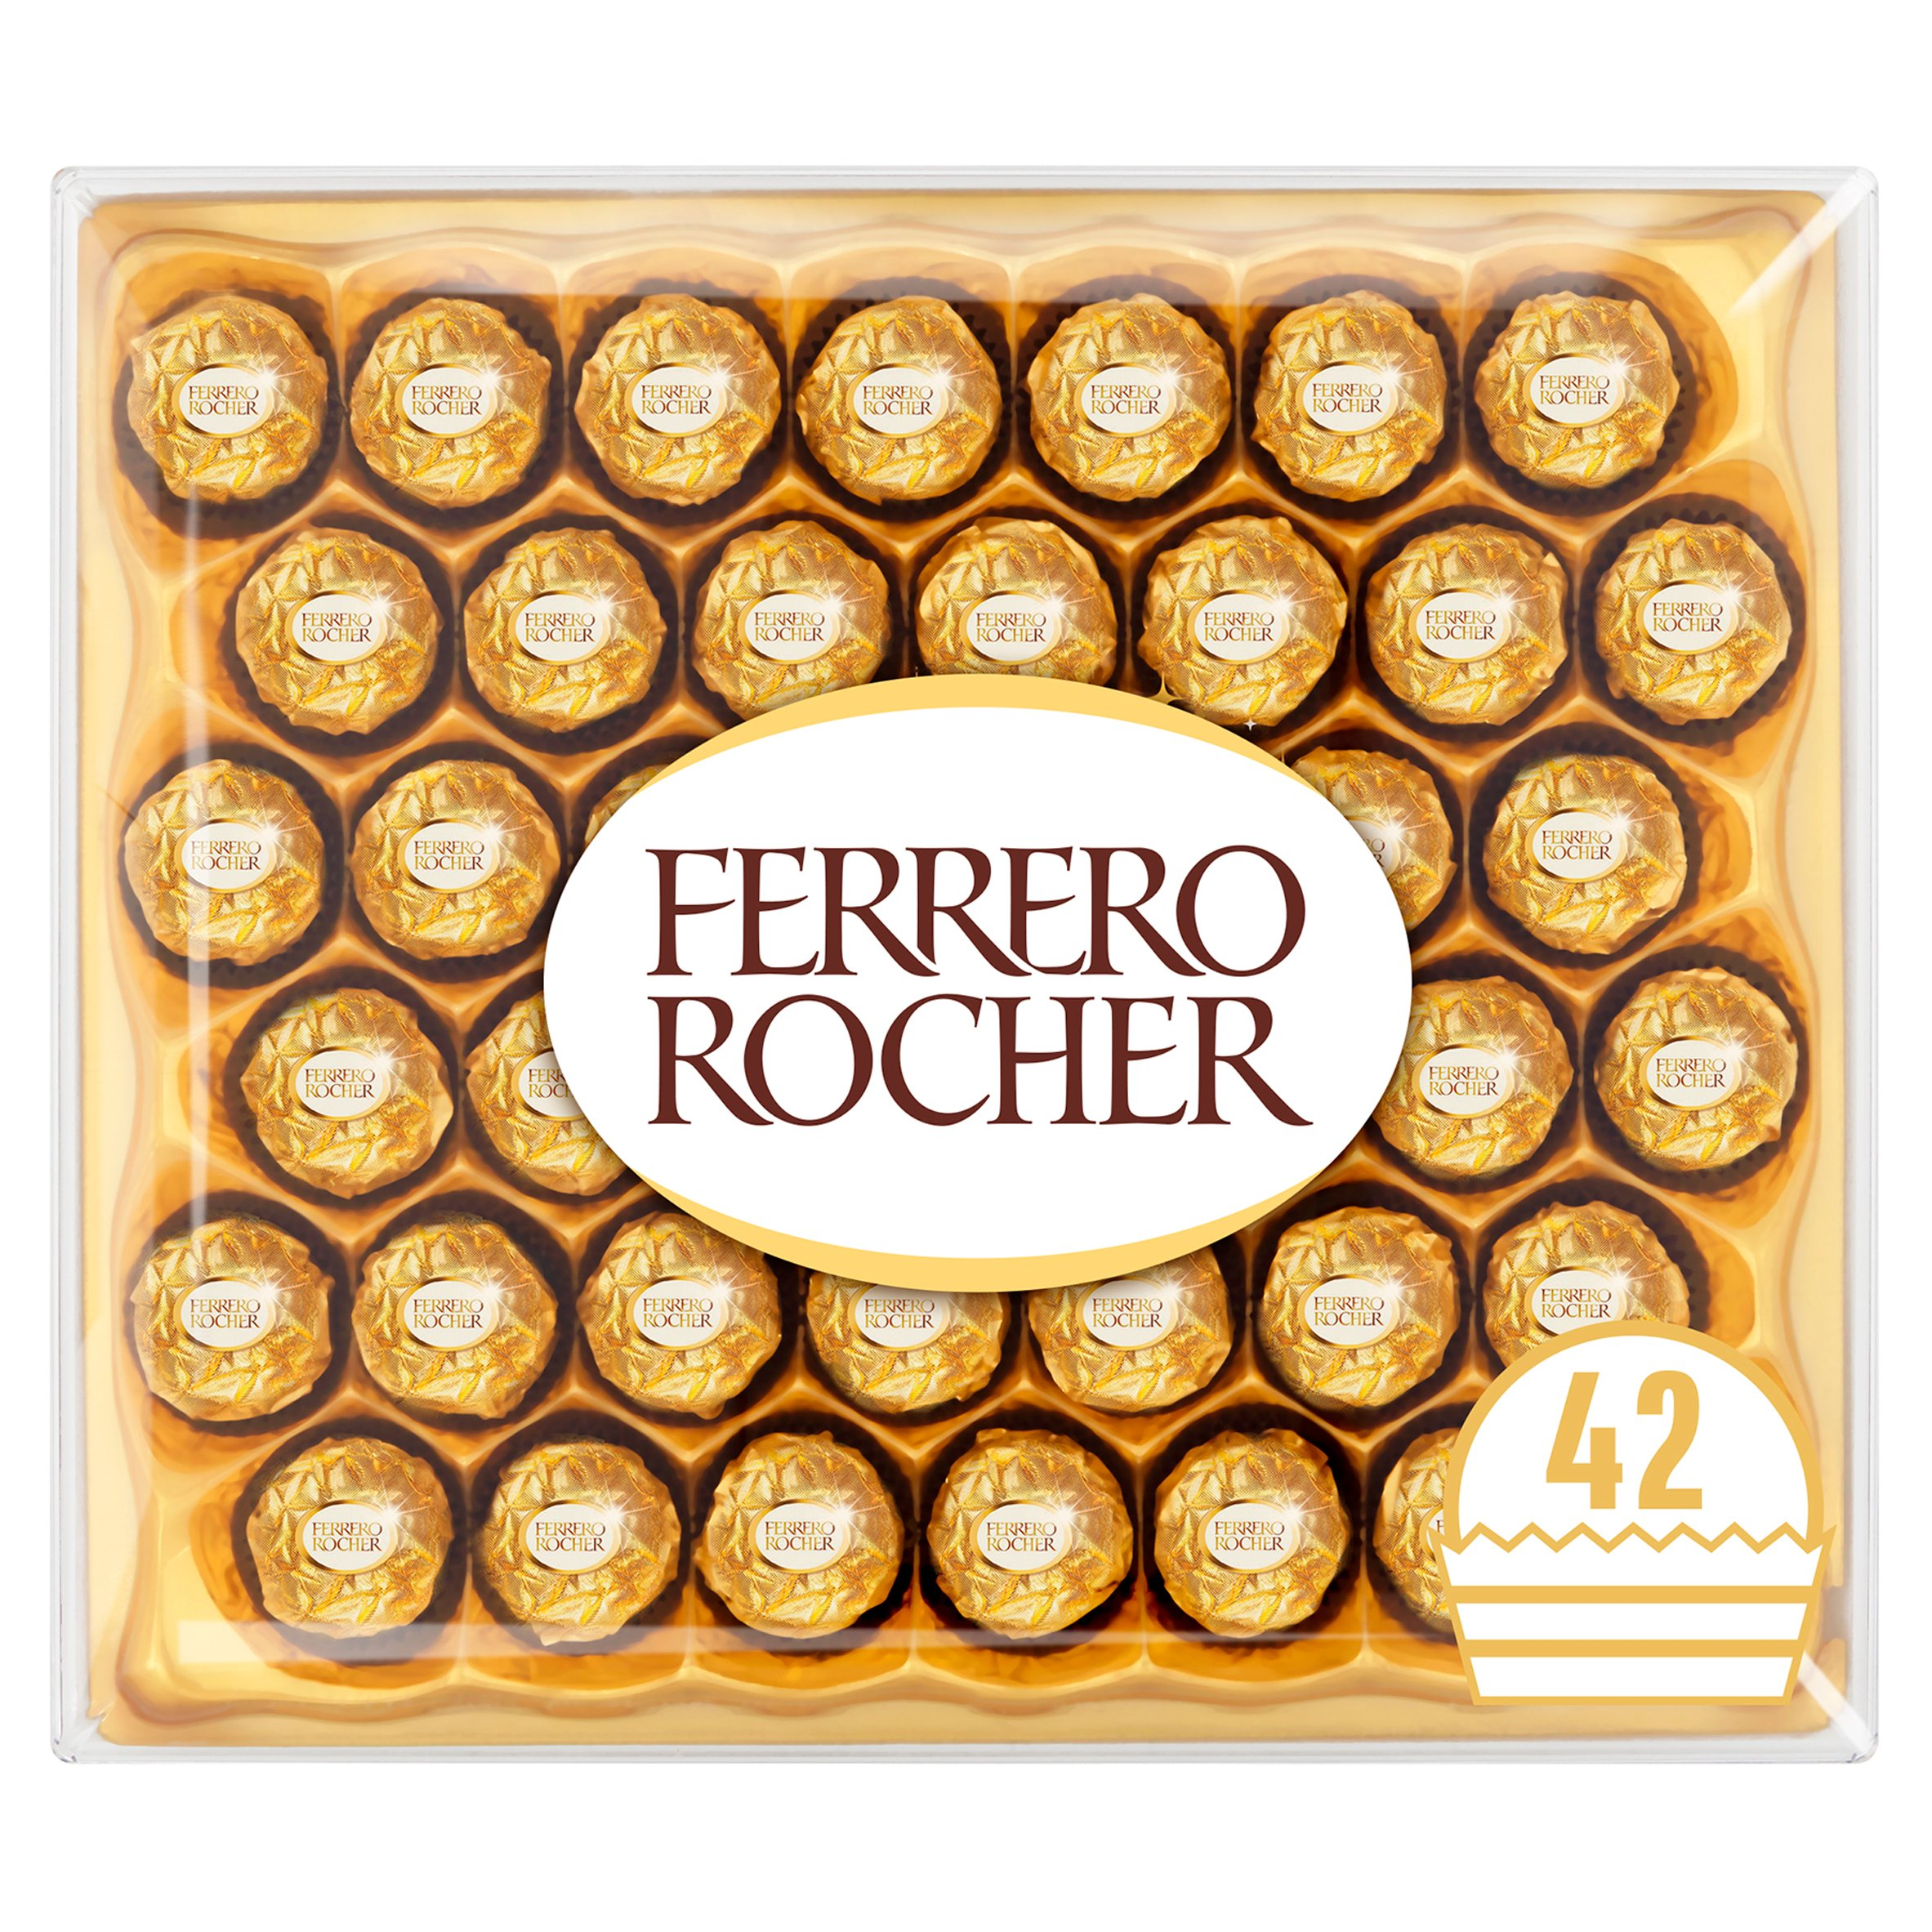 Ferrero Rocher T42 525G